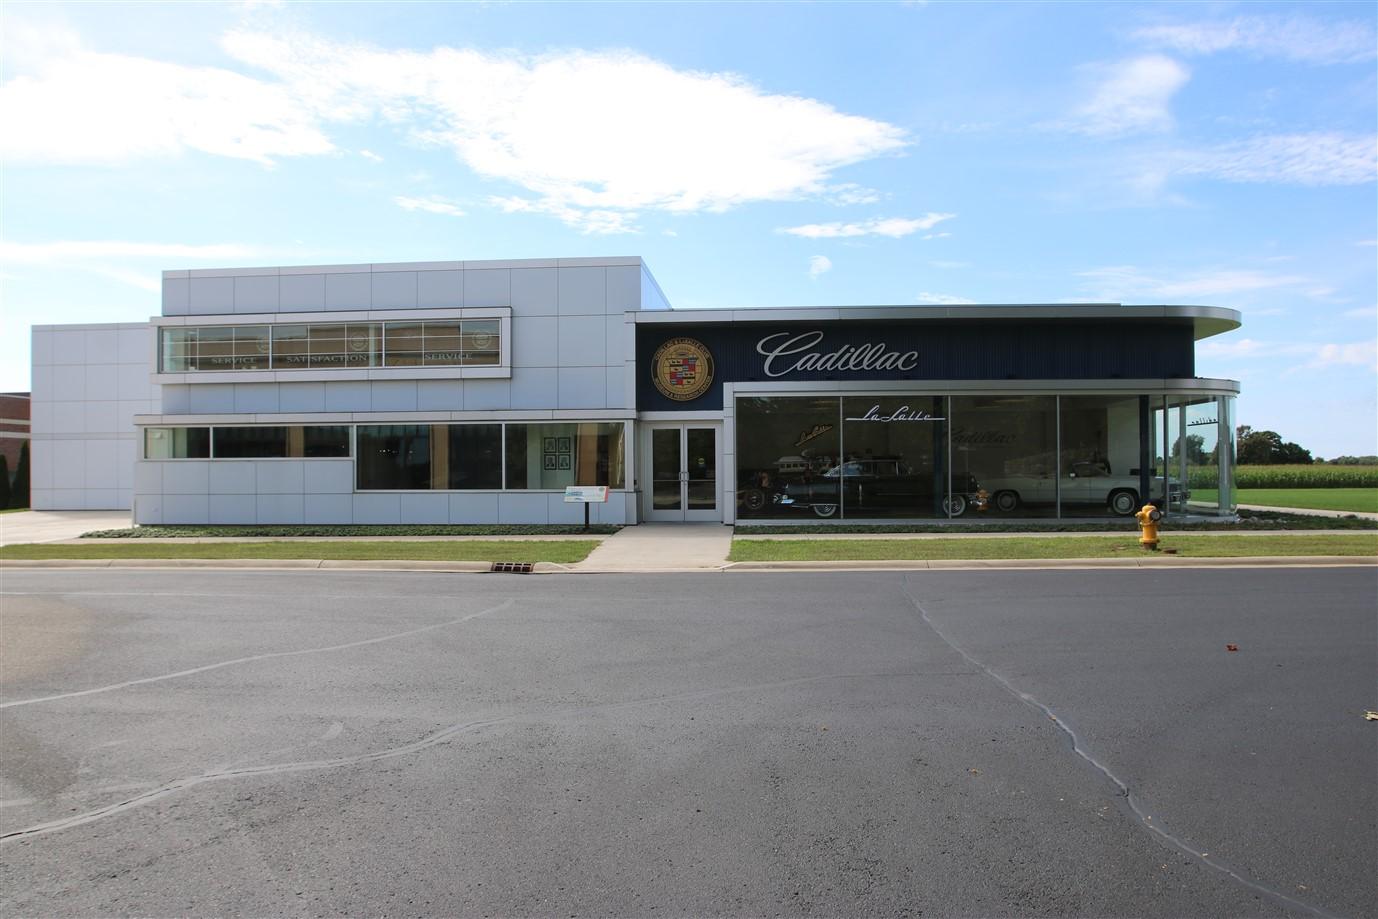 2018 09 03 307 Hickory Corners MI Gilmore Car Museum.jpg